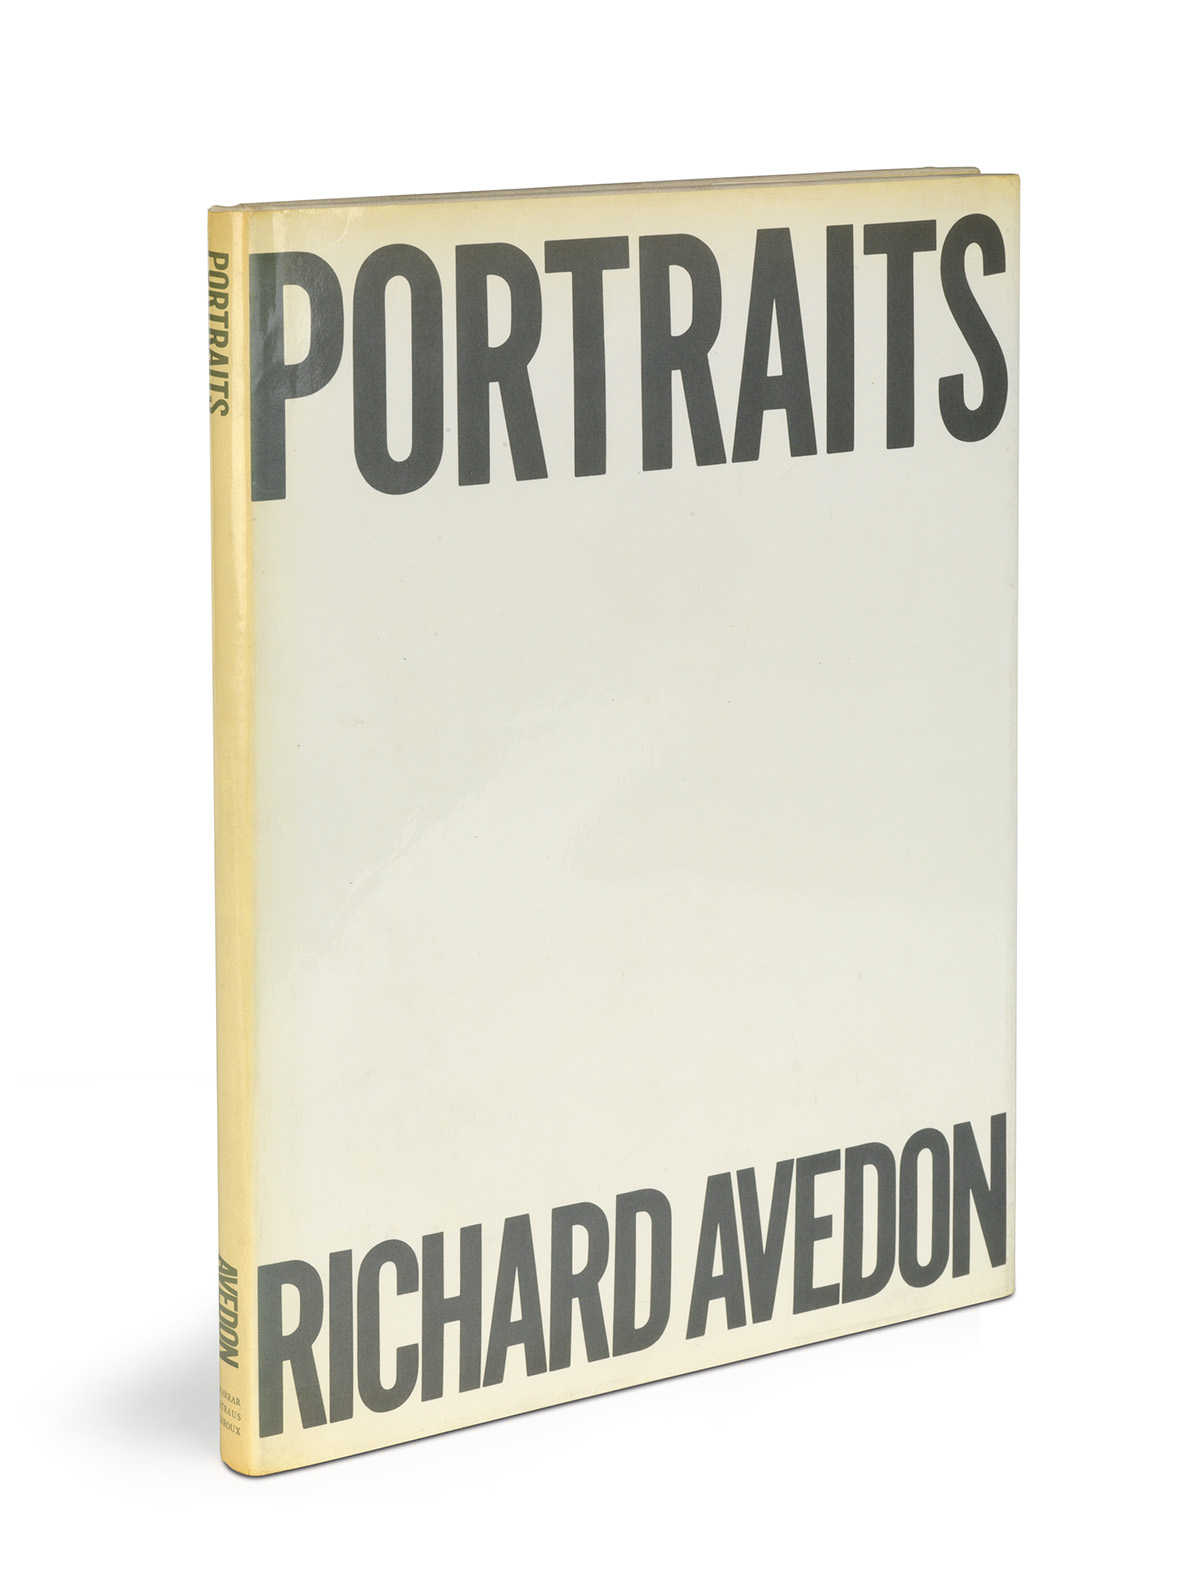 RICHARD AVEDON. Avedon: Photographs 1947-1977 * Portraits.